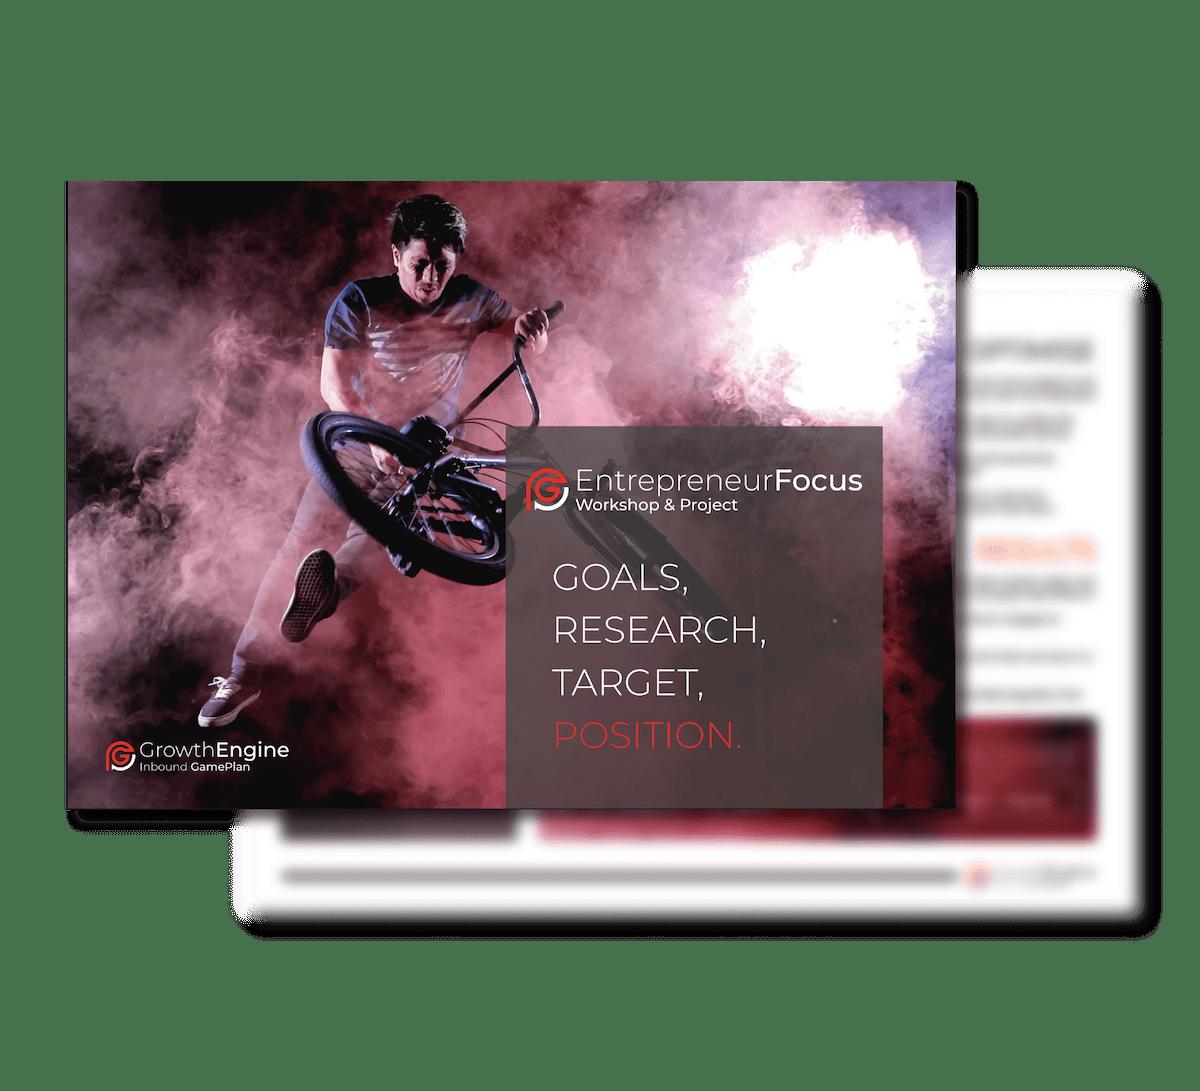 TSH - GrowthEngine Slick Covers_Entrepreneur Focus